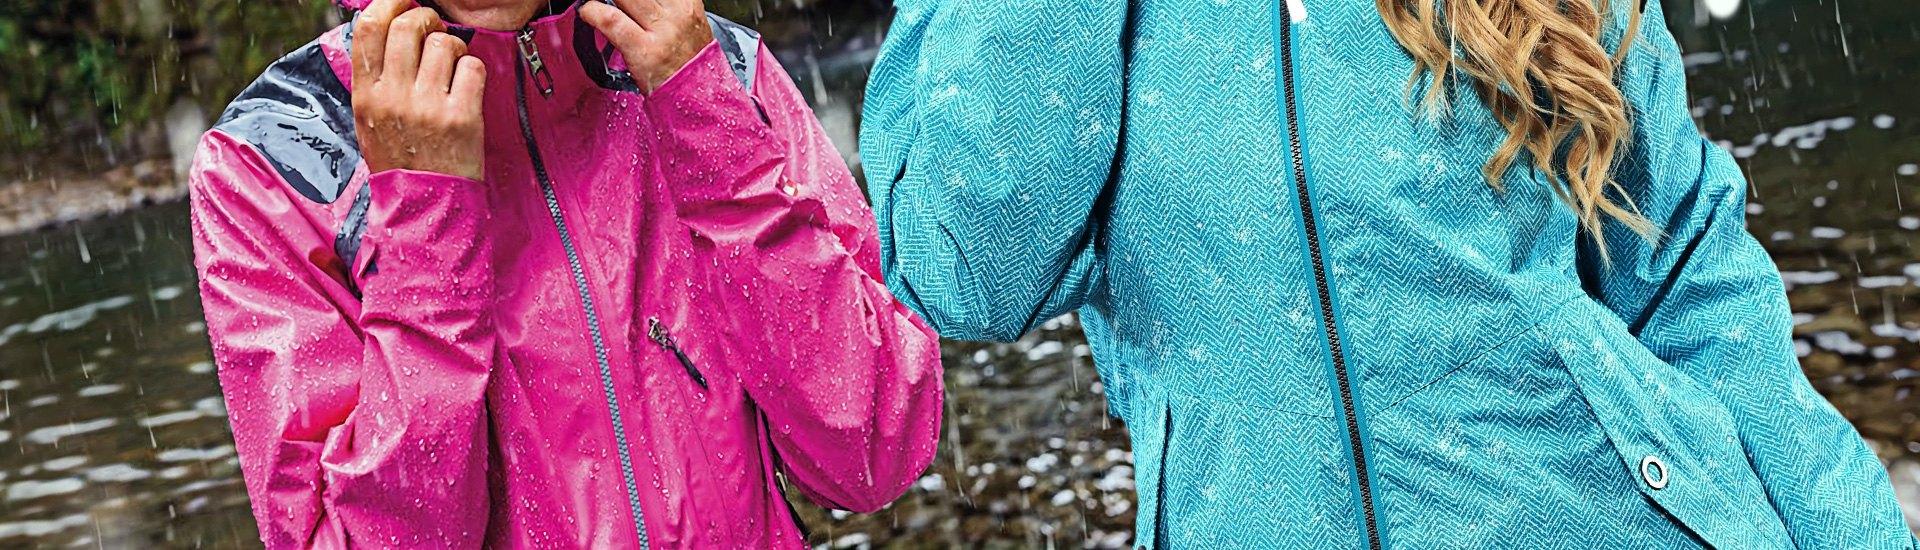 JOE ROCKET LADIES RS2 2 PIECE RAIN SUIT BLACK HI VIS FREE SHIPPING